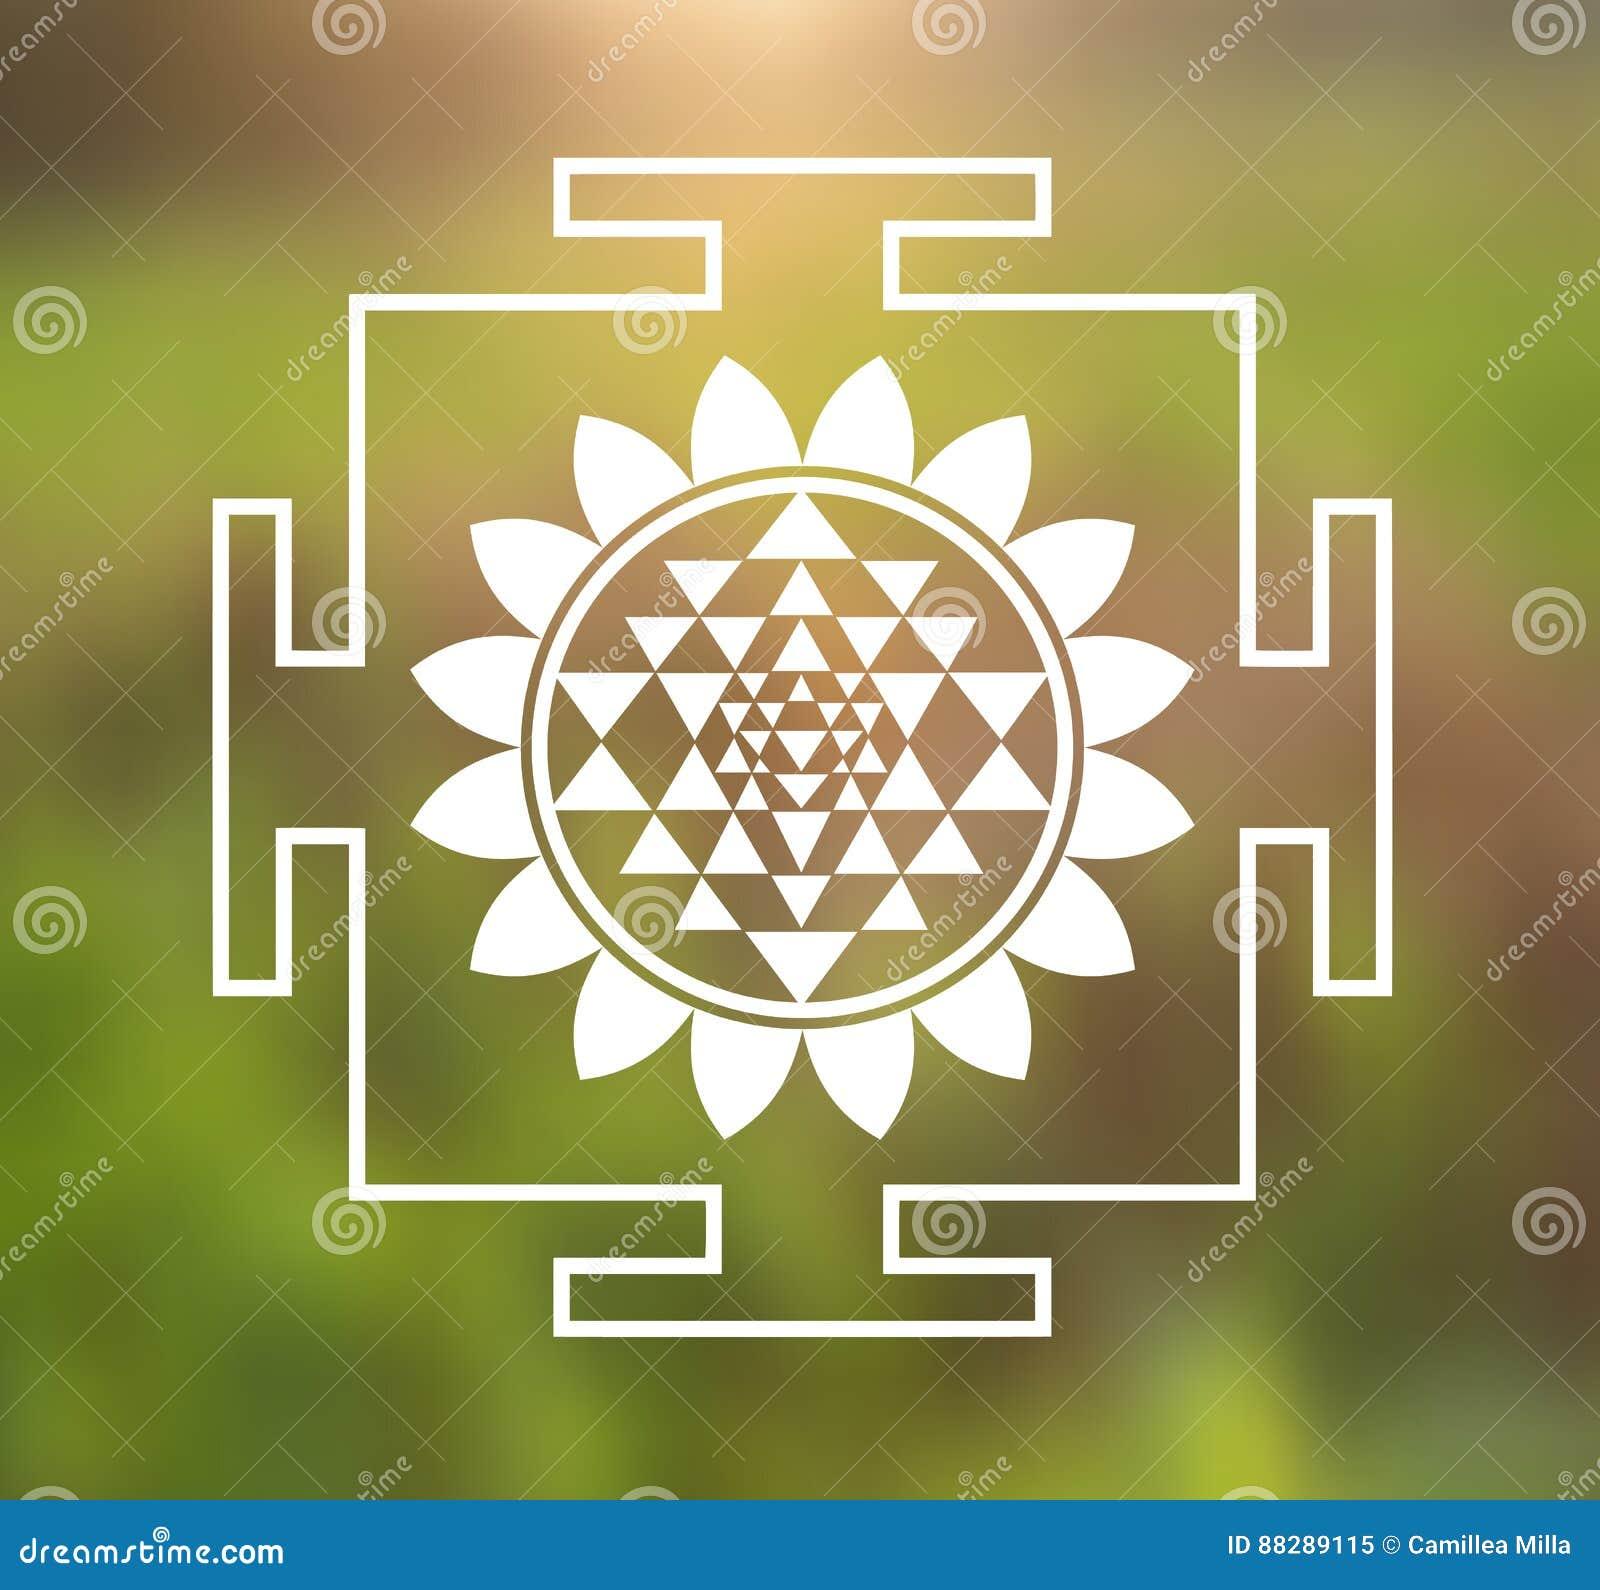 Vector sri yantra illustration with lotus flower on a natural download vector sri yantra illustration with lotus flower on a natural background stock vector illustration izmirmasajfo